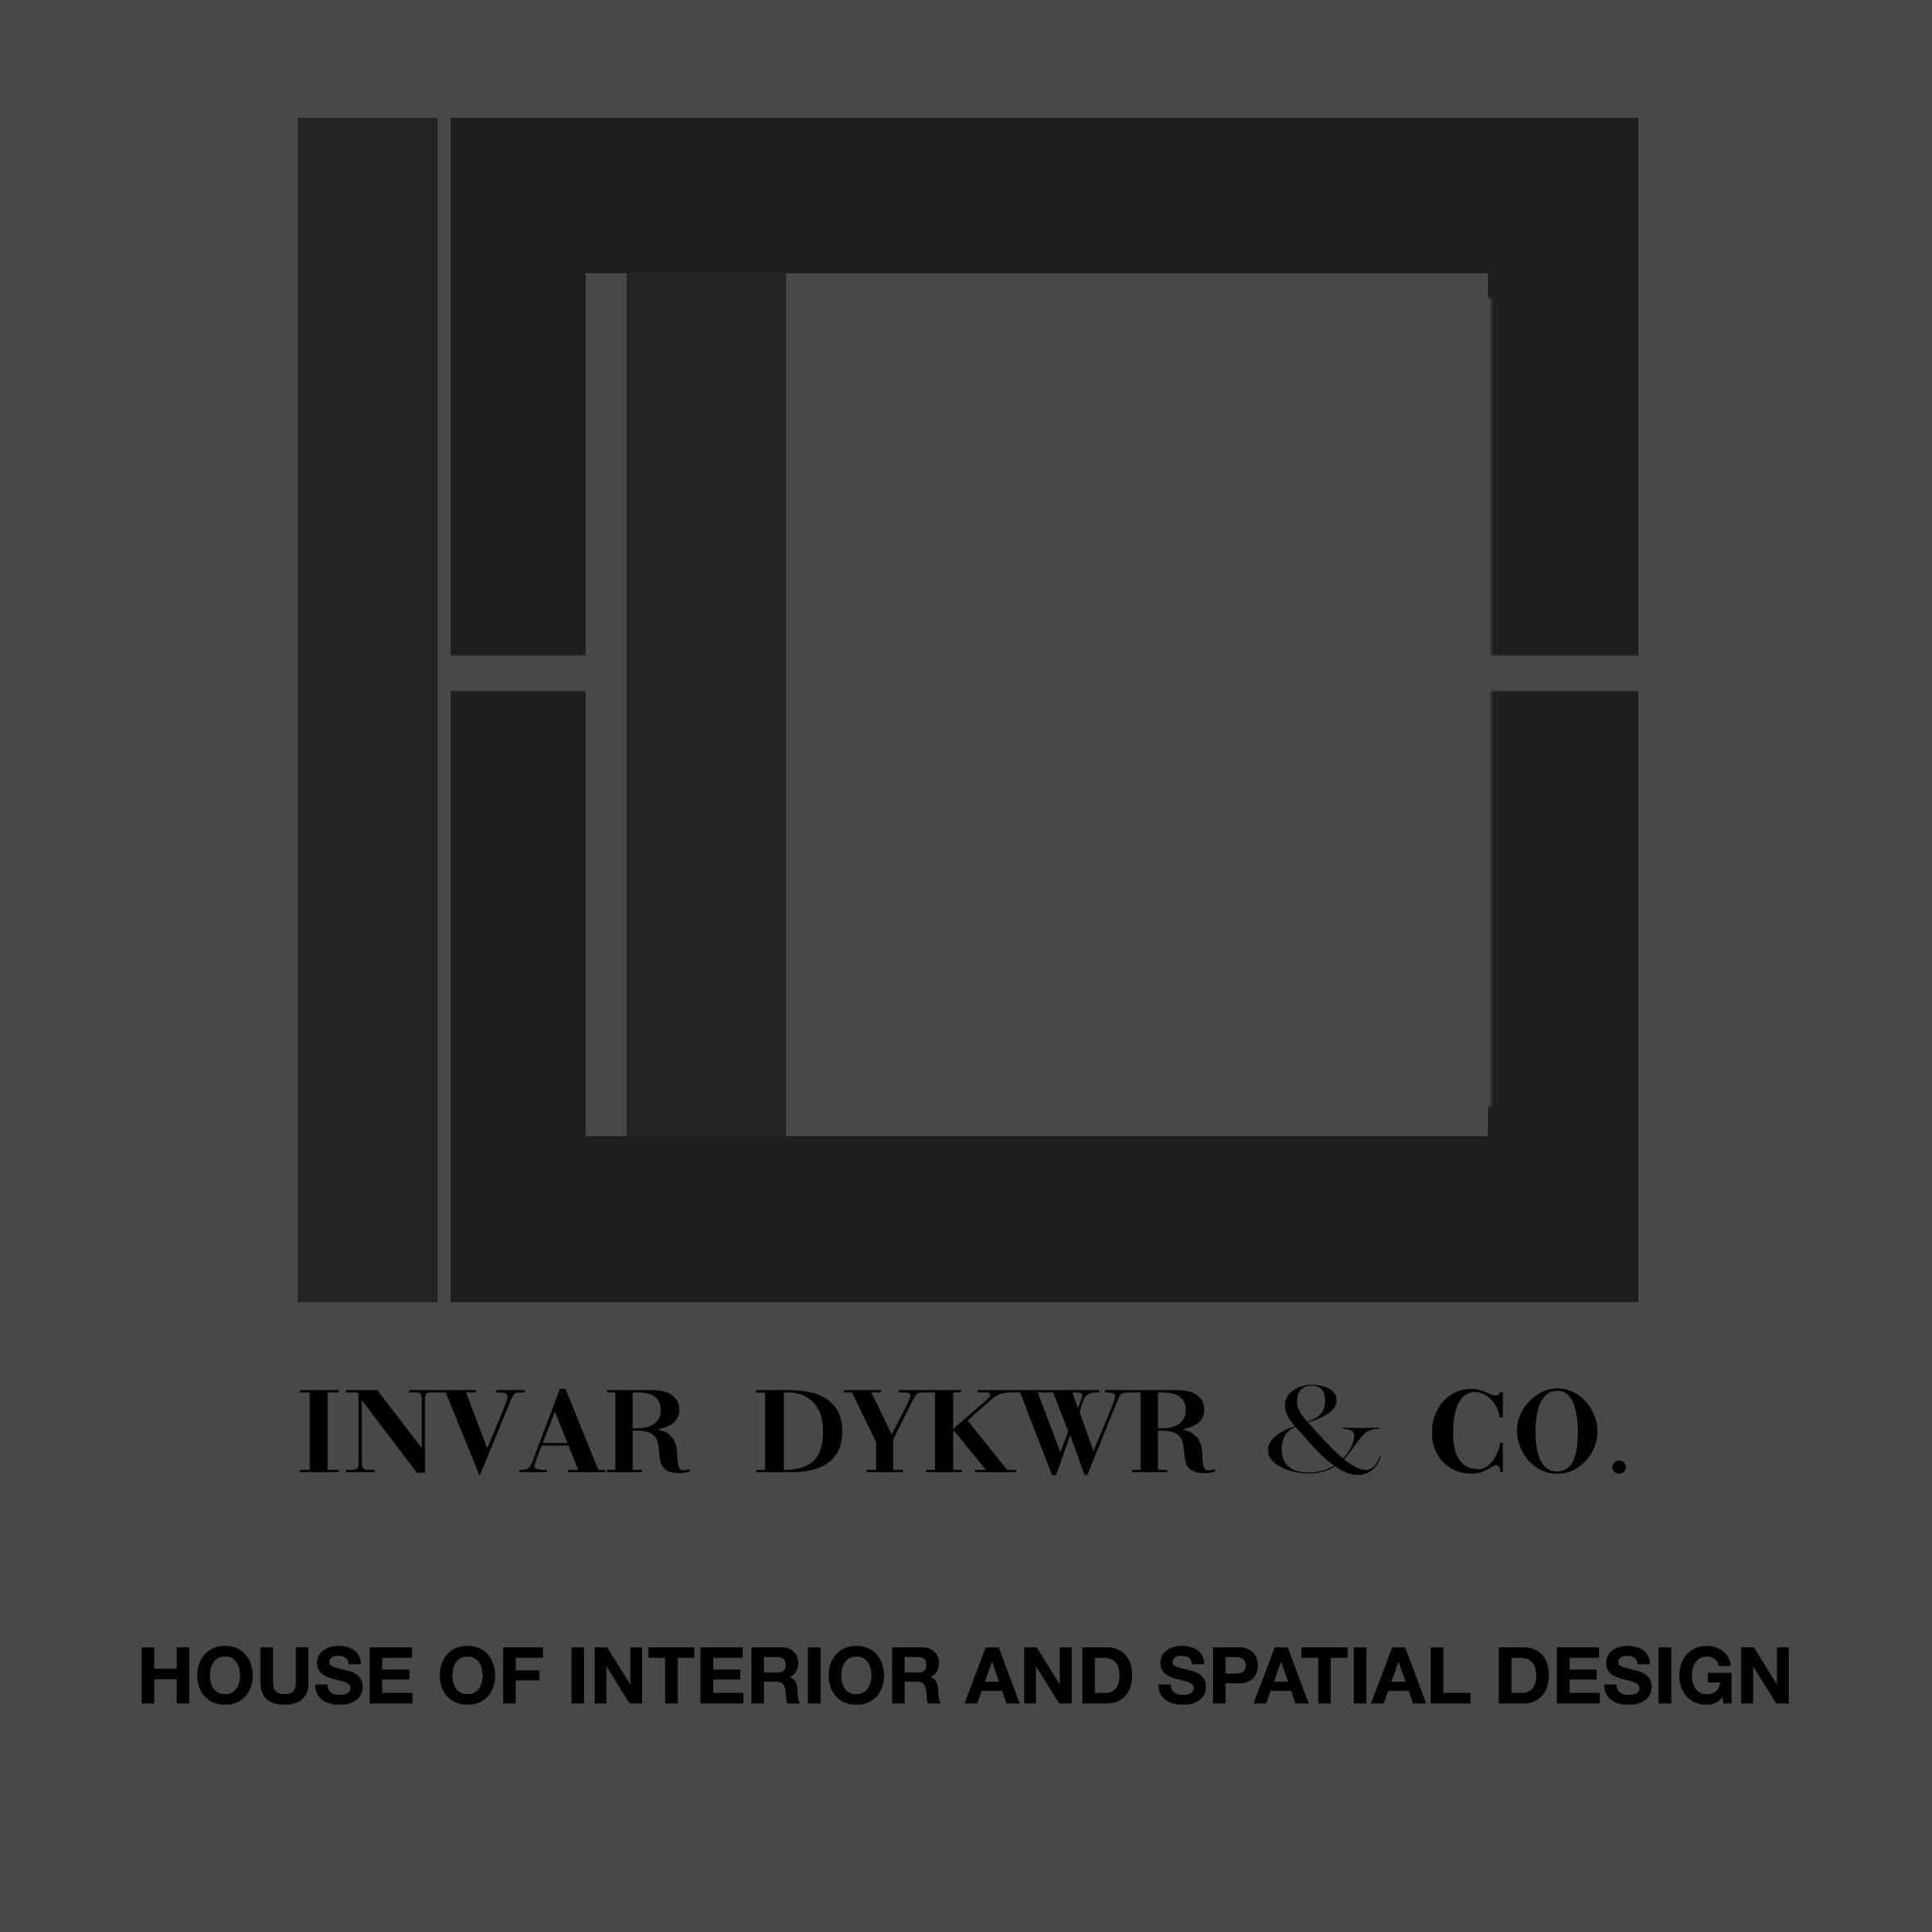 INVAR DYKWR & CO.